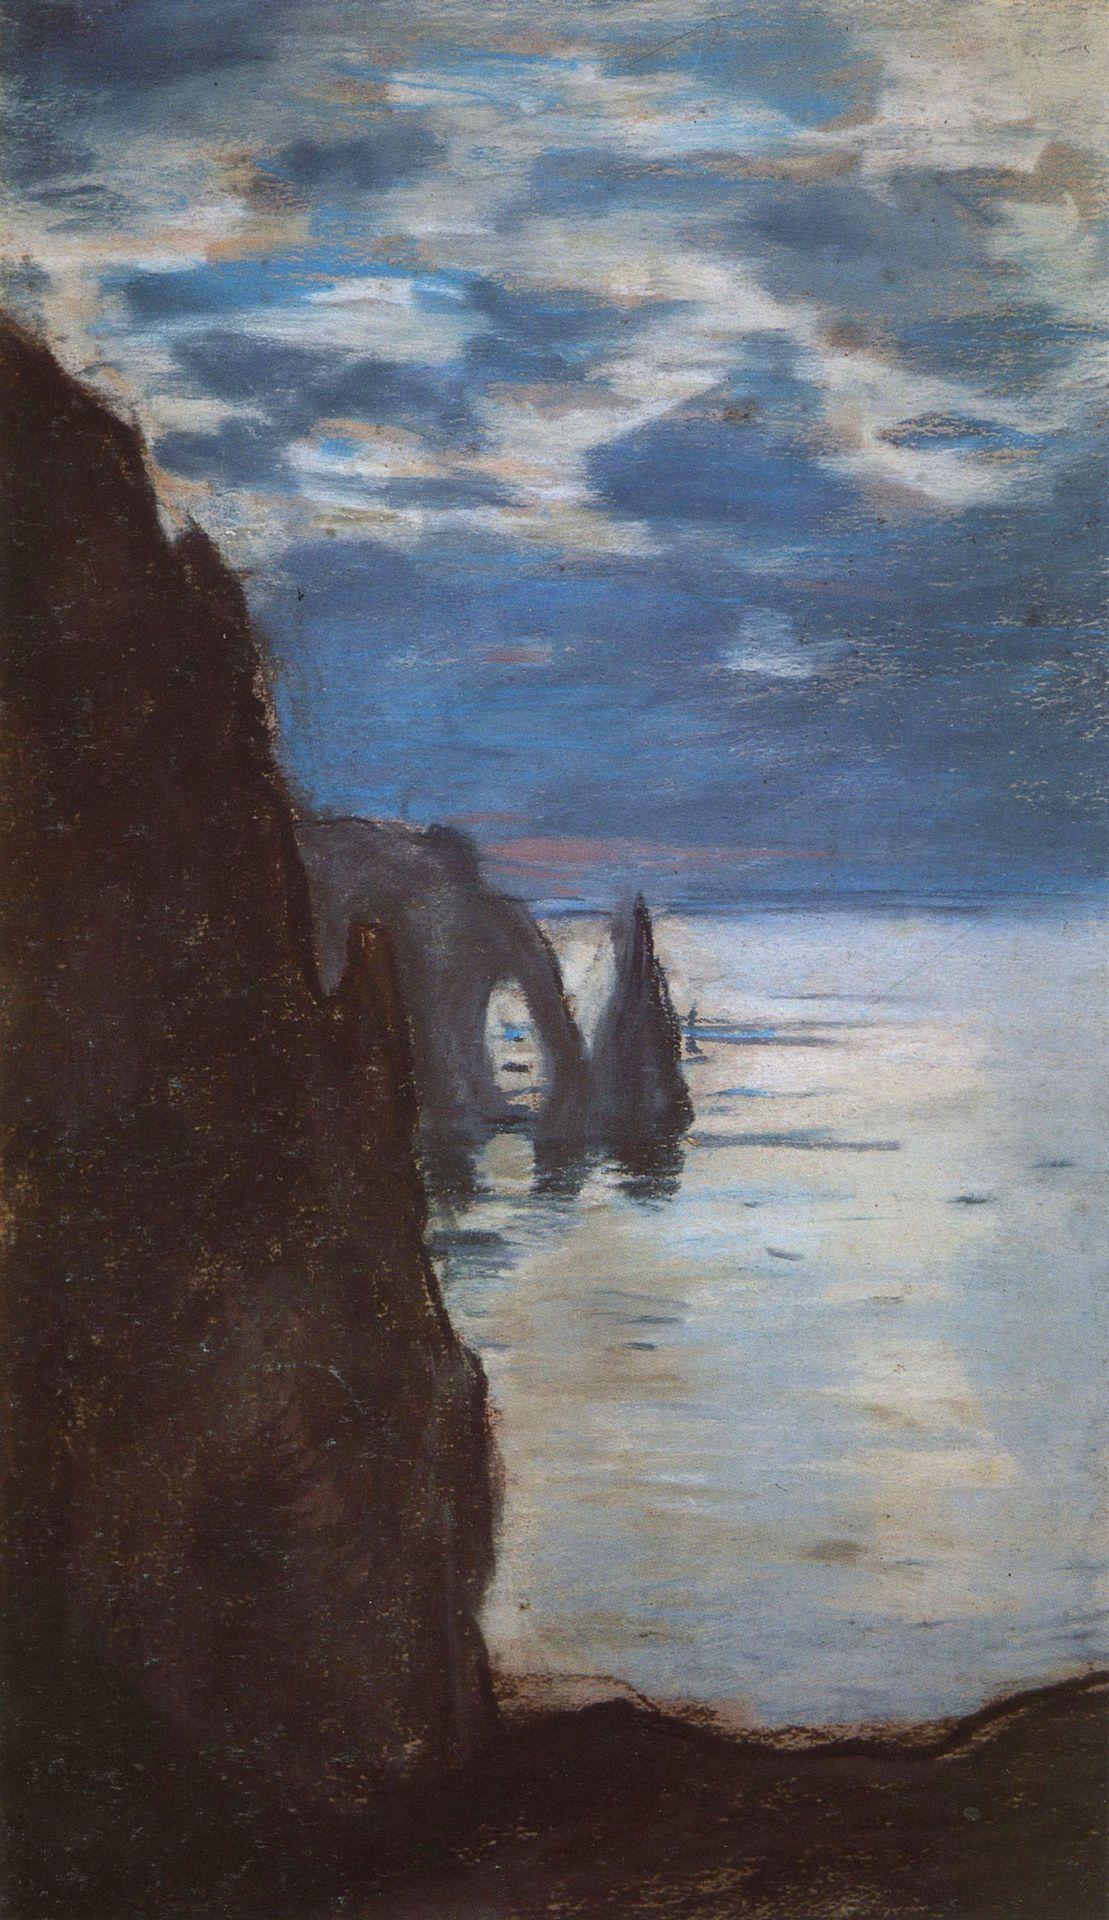 CLAUDE MONET Etretat, the Needle Rock and porte d'Aval, 1885